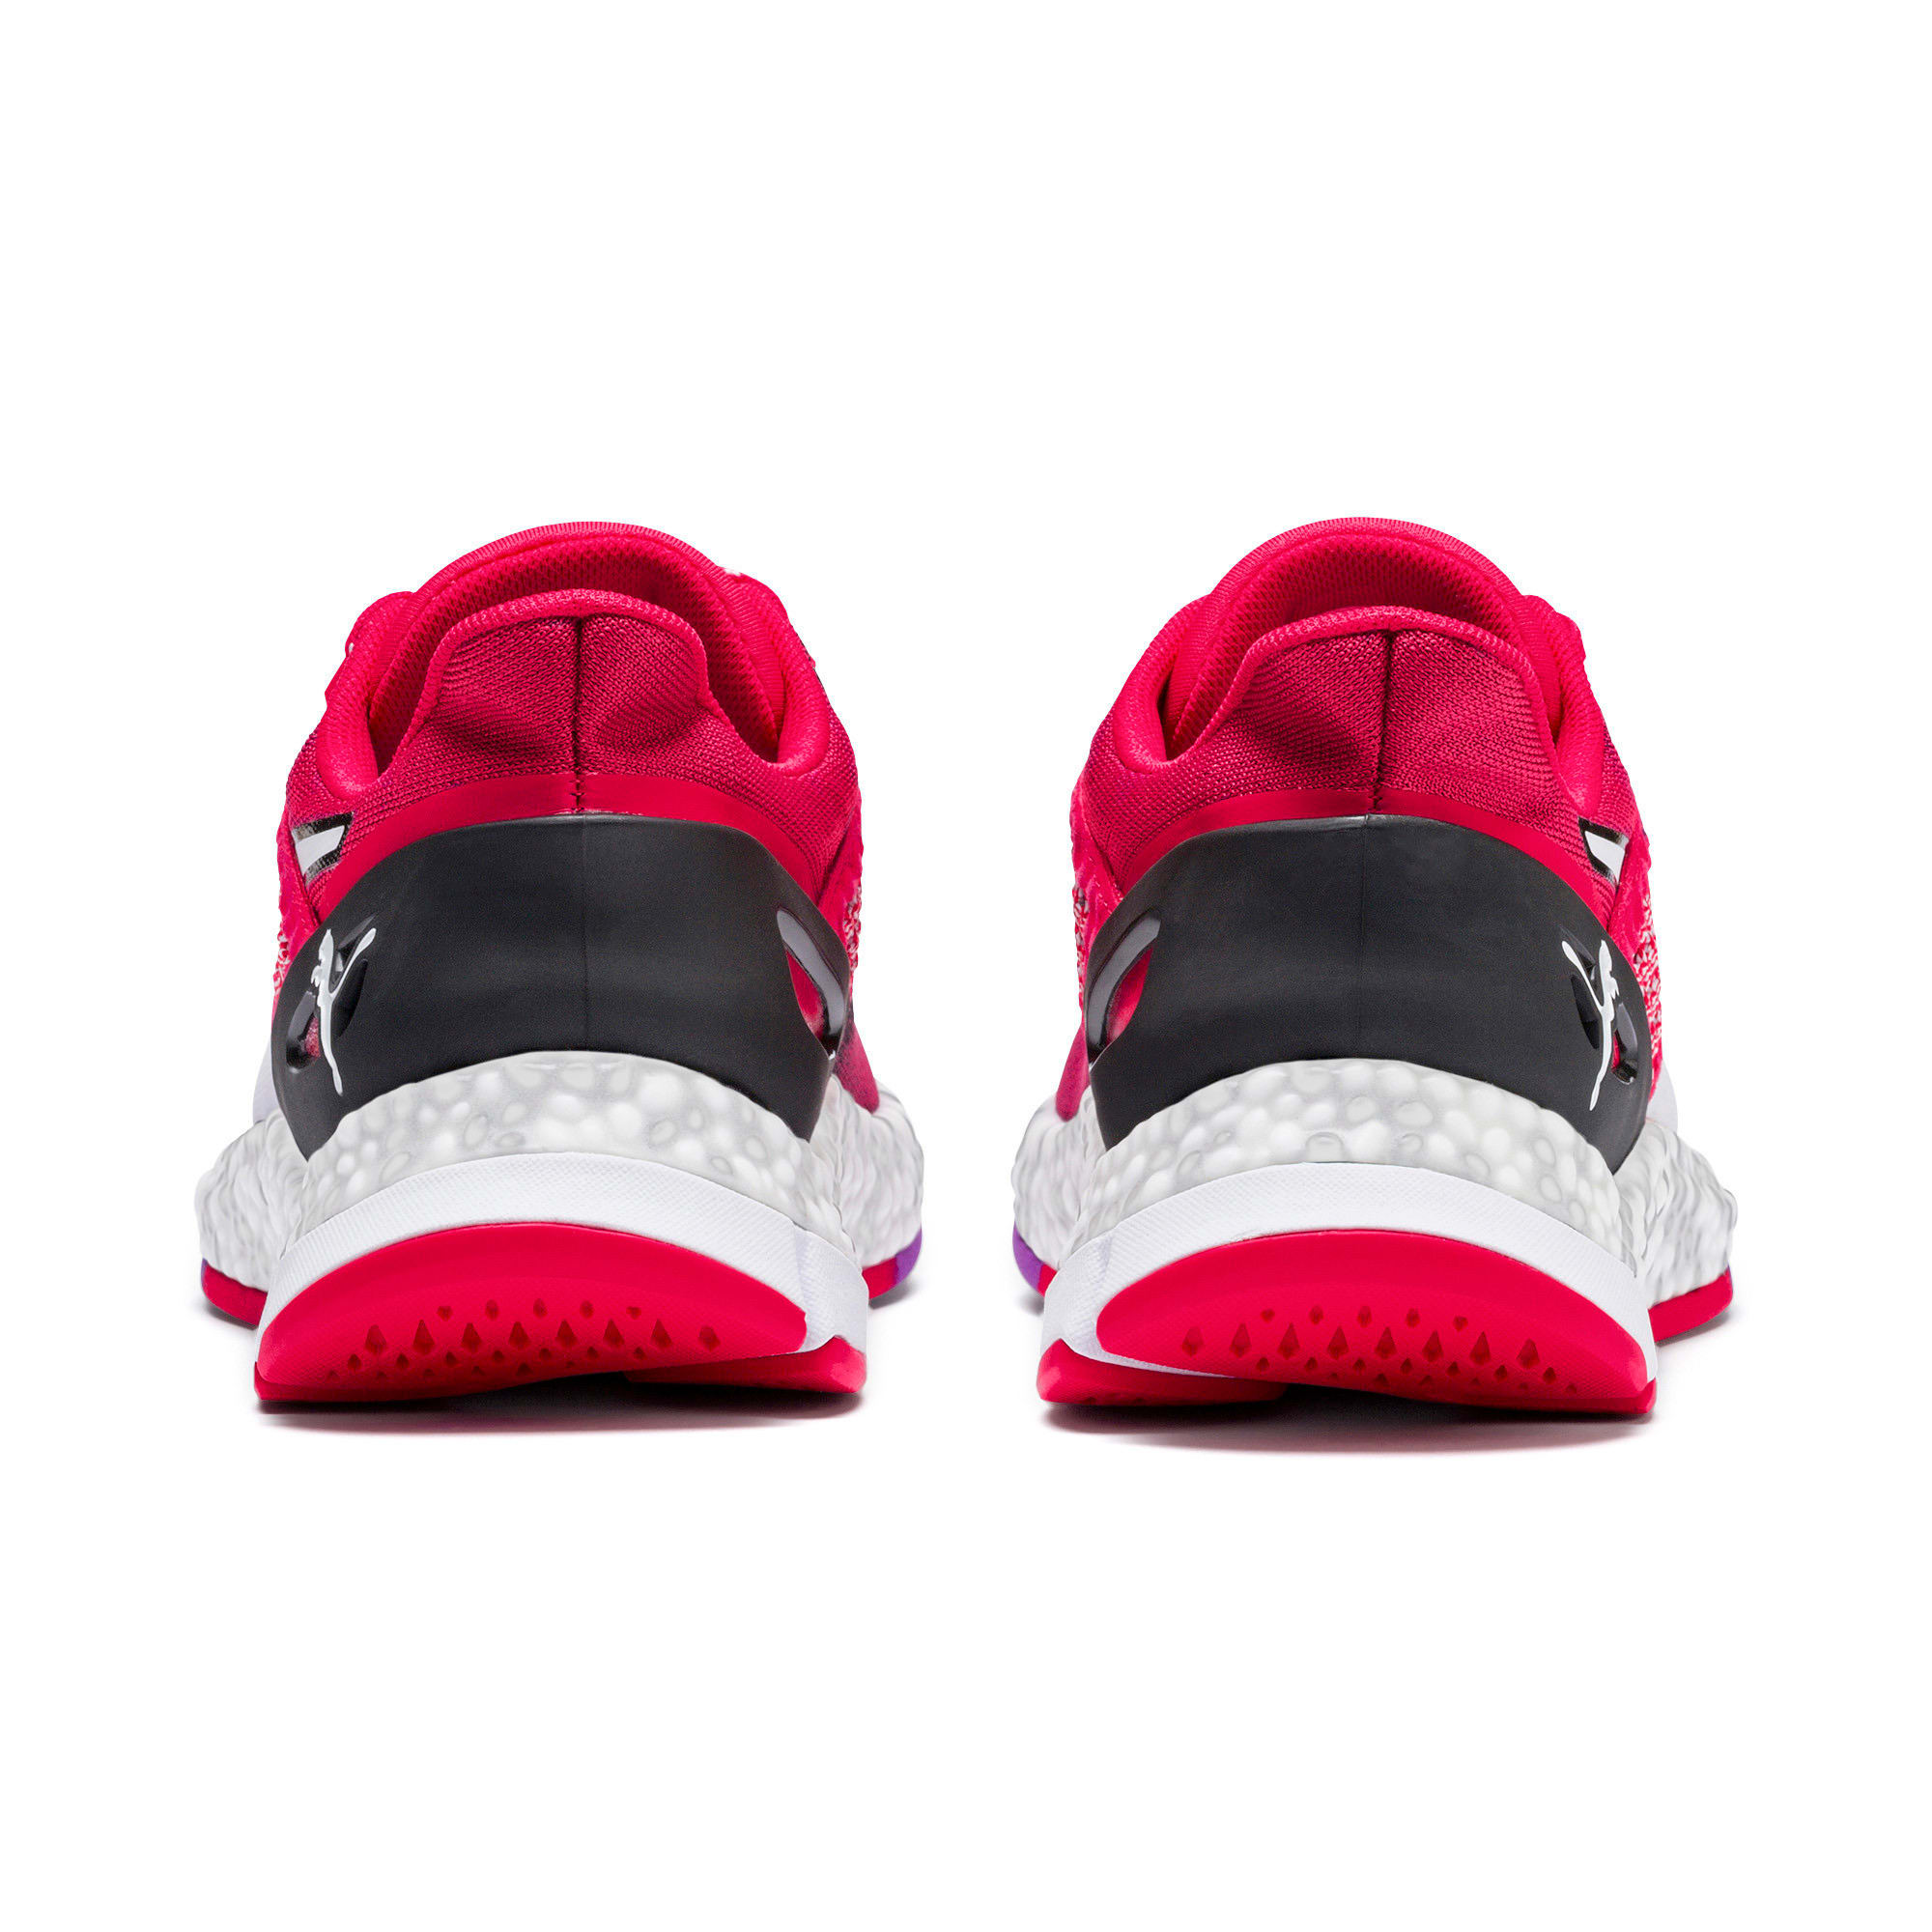 Thumbnail 4 of HYBRID NETFIT Astro Women's Running Shoes, Nrgy Rose-Puma Black, medium